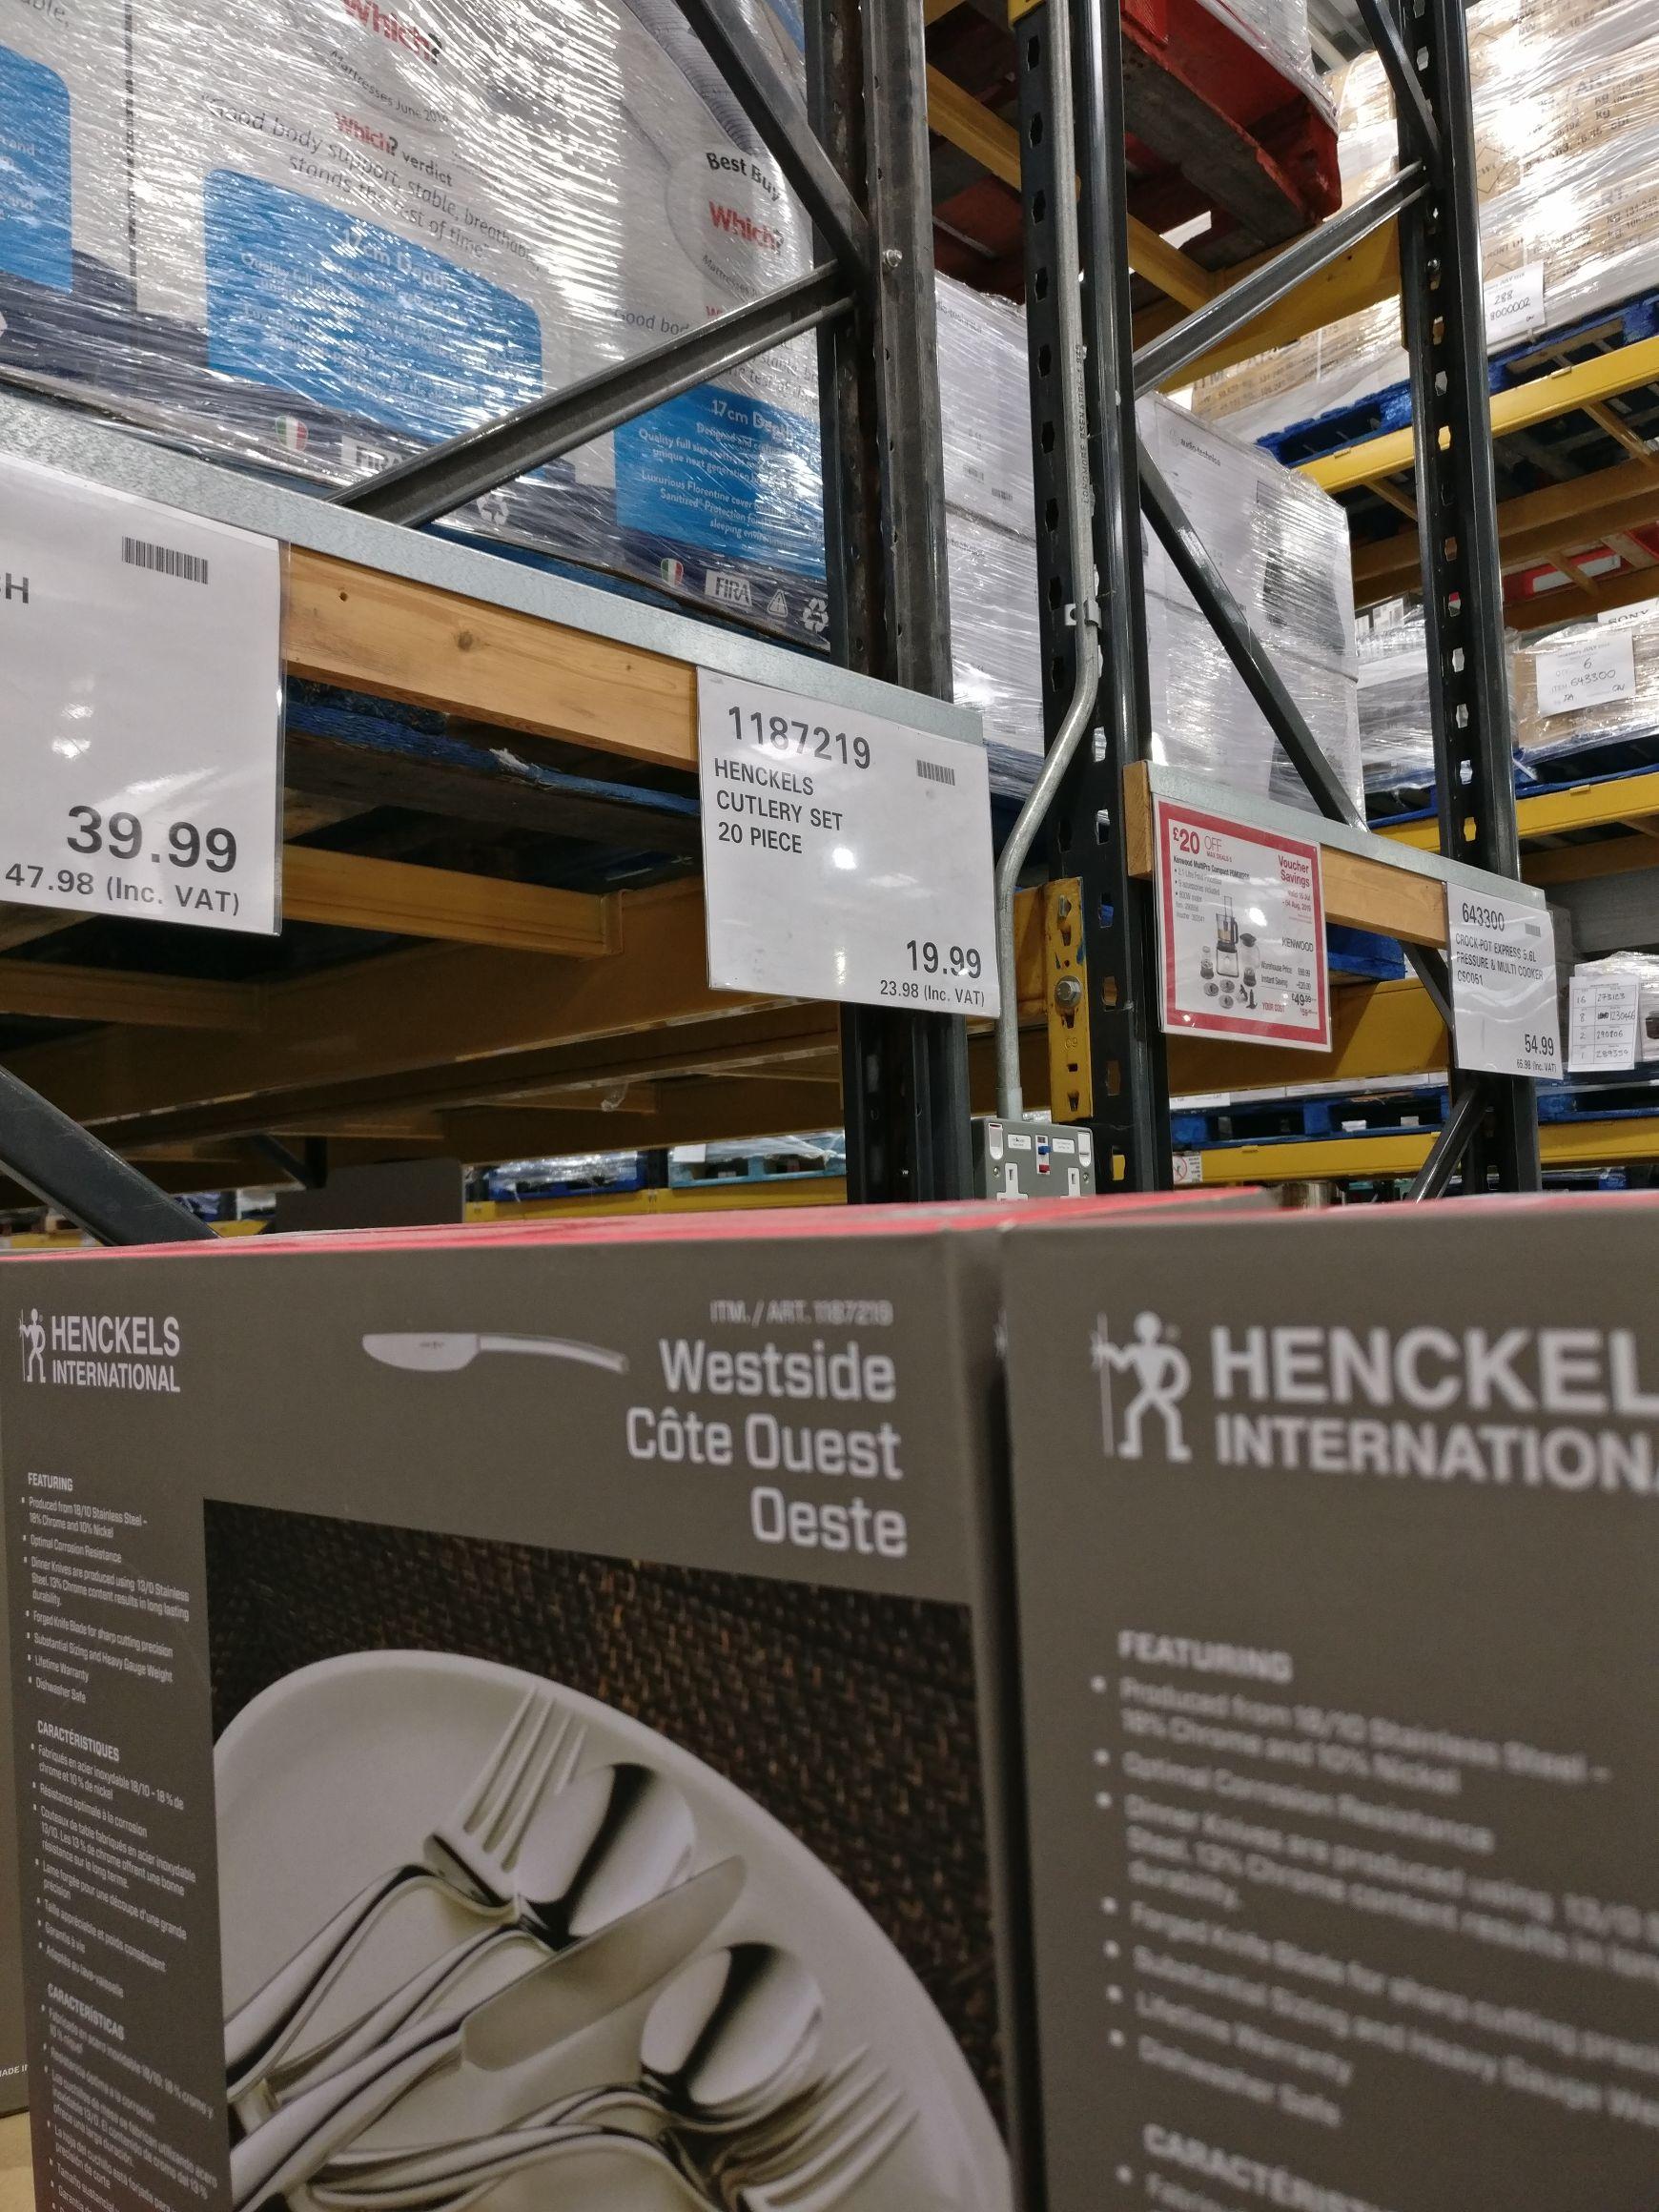 Henckels international Cutlery Set 20 Piece (18/10 stainless steel) Costco (Purley Way)